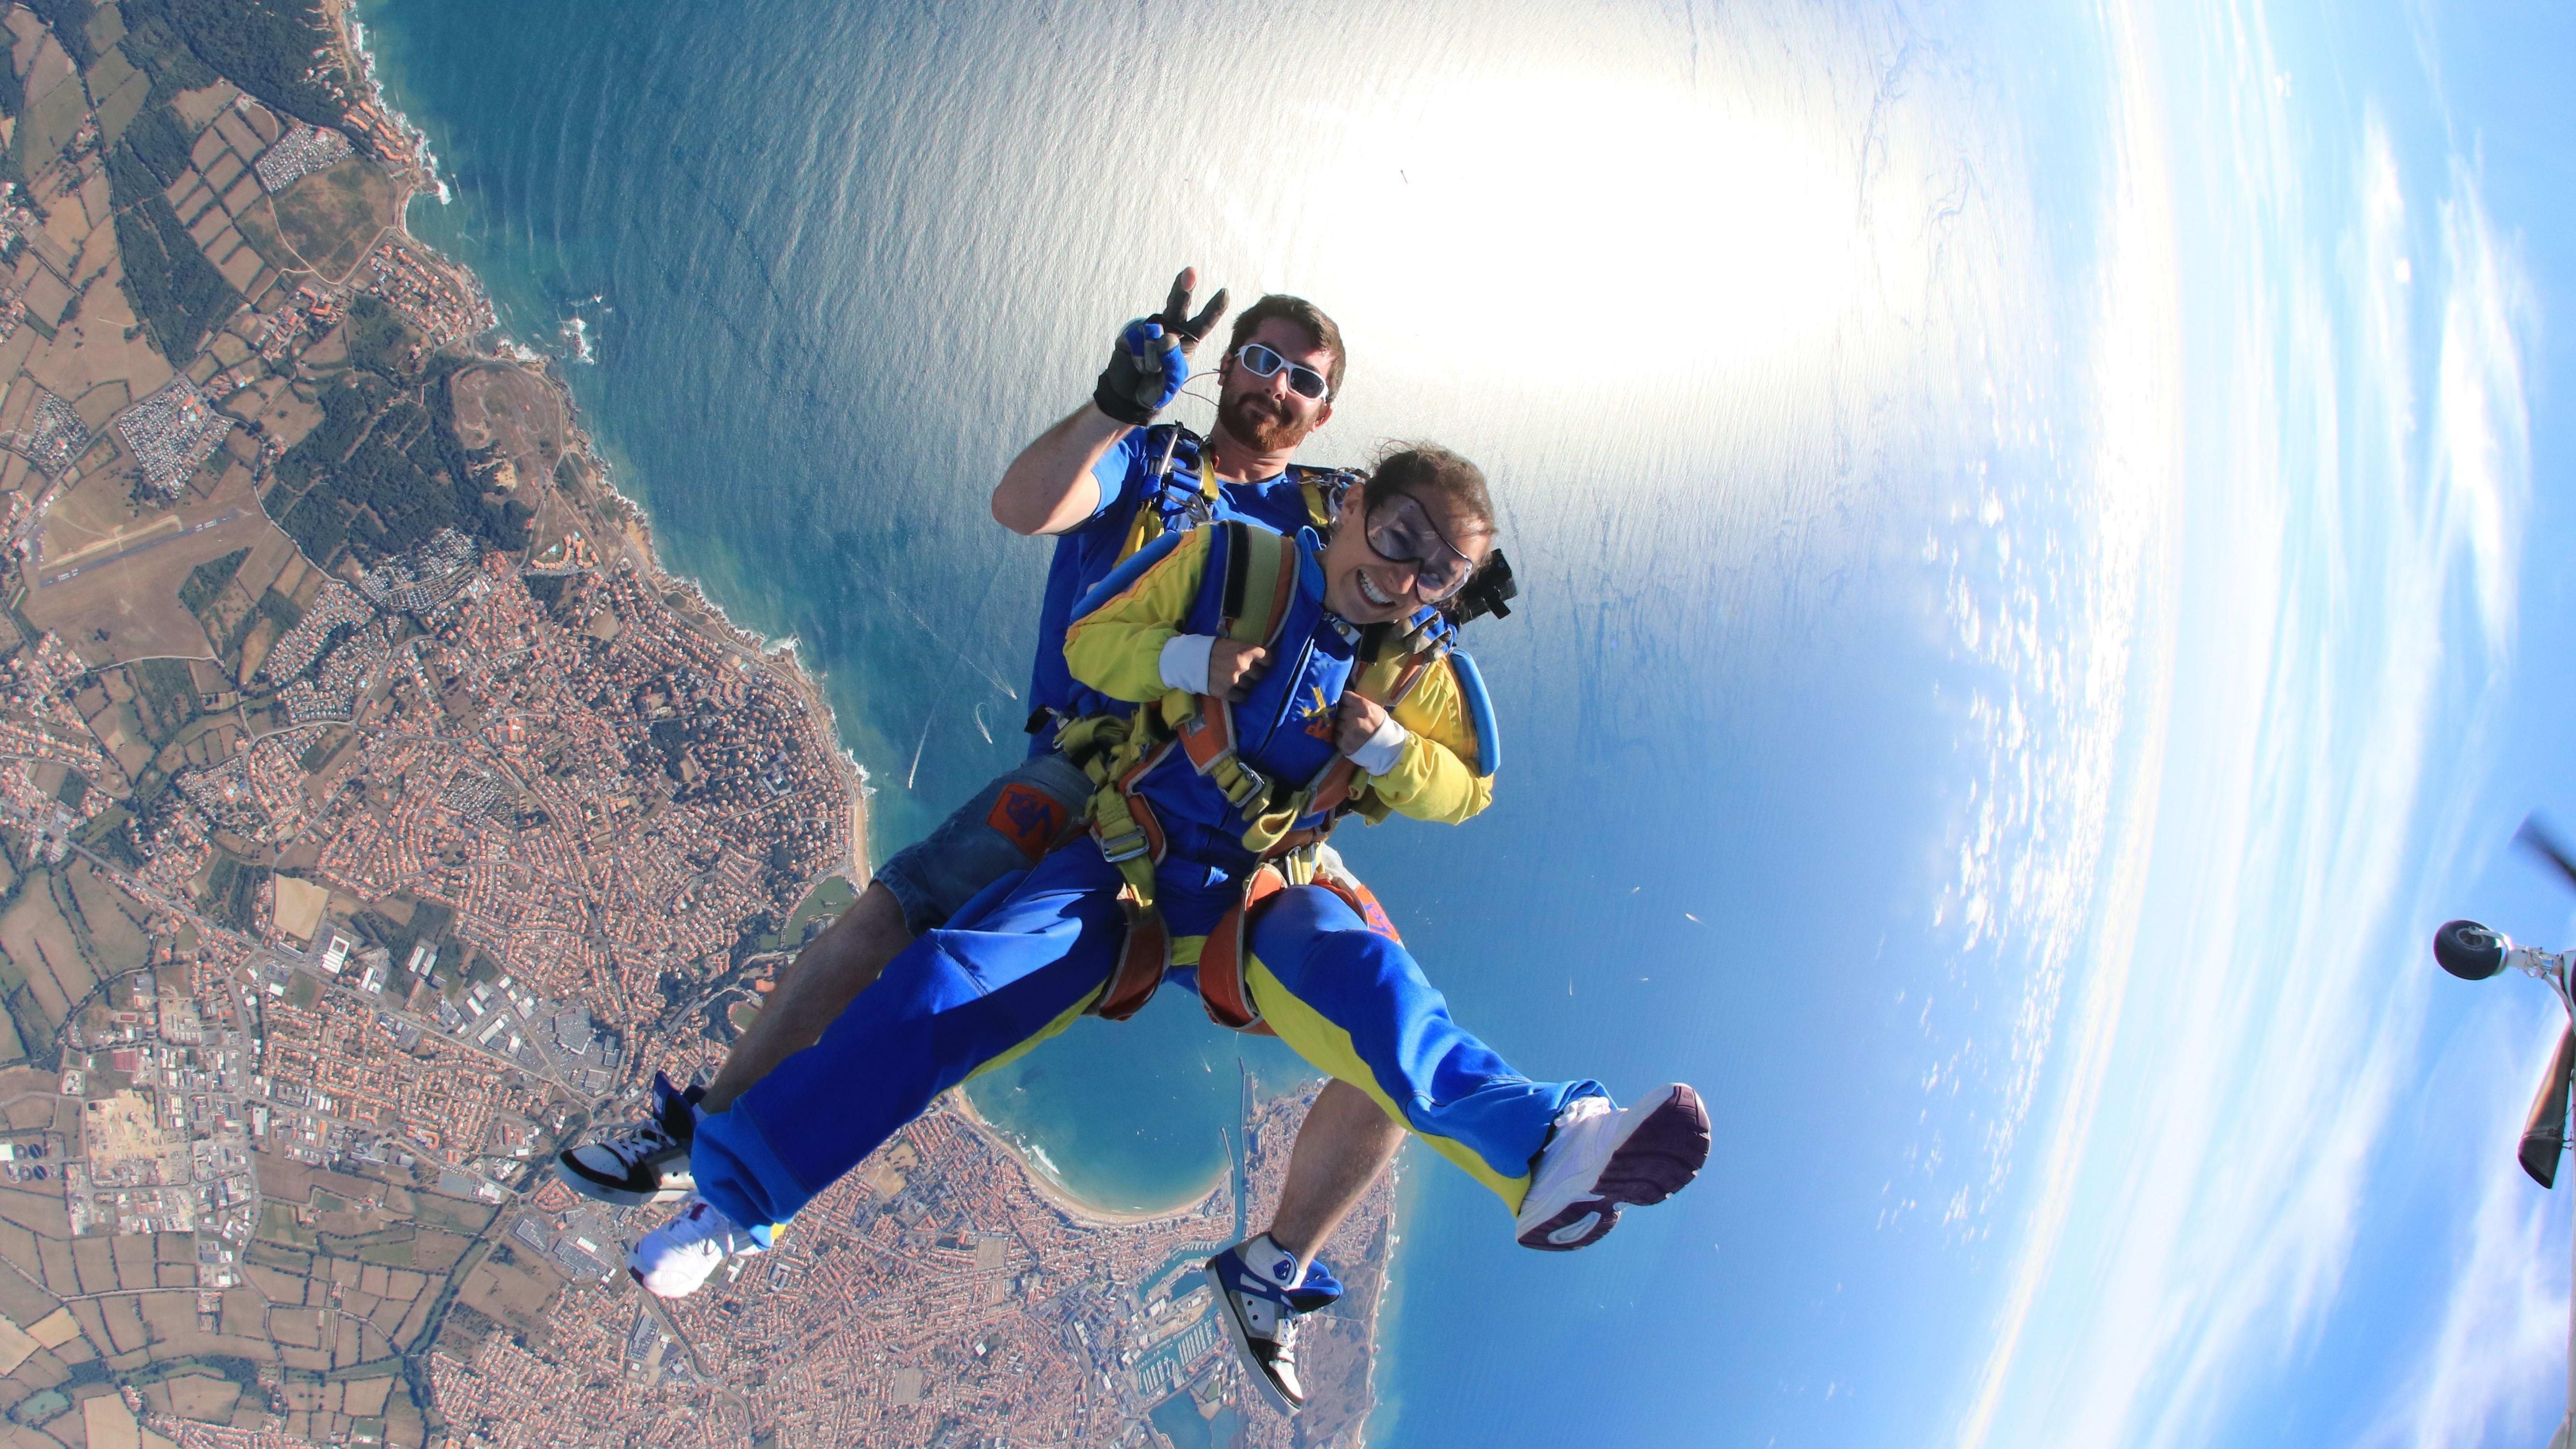 chute parachute